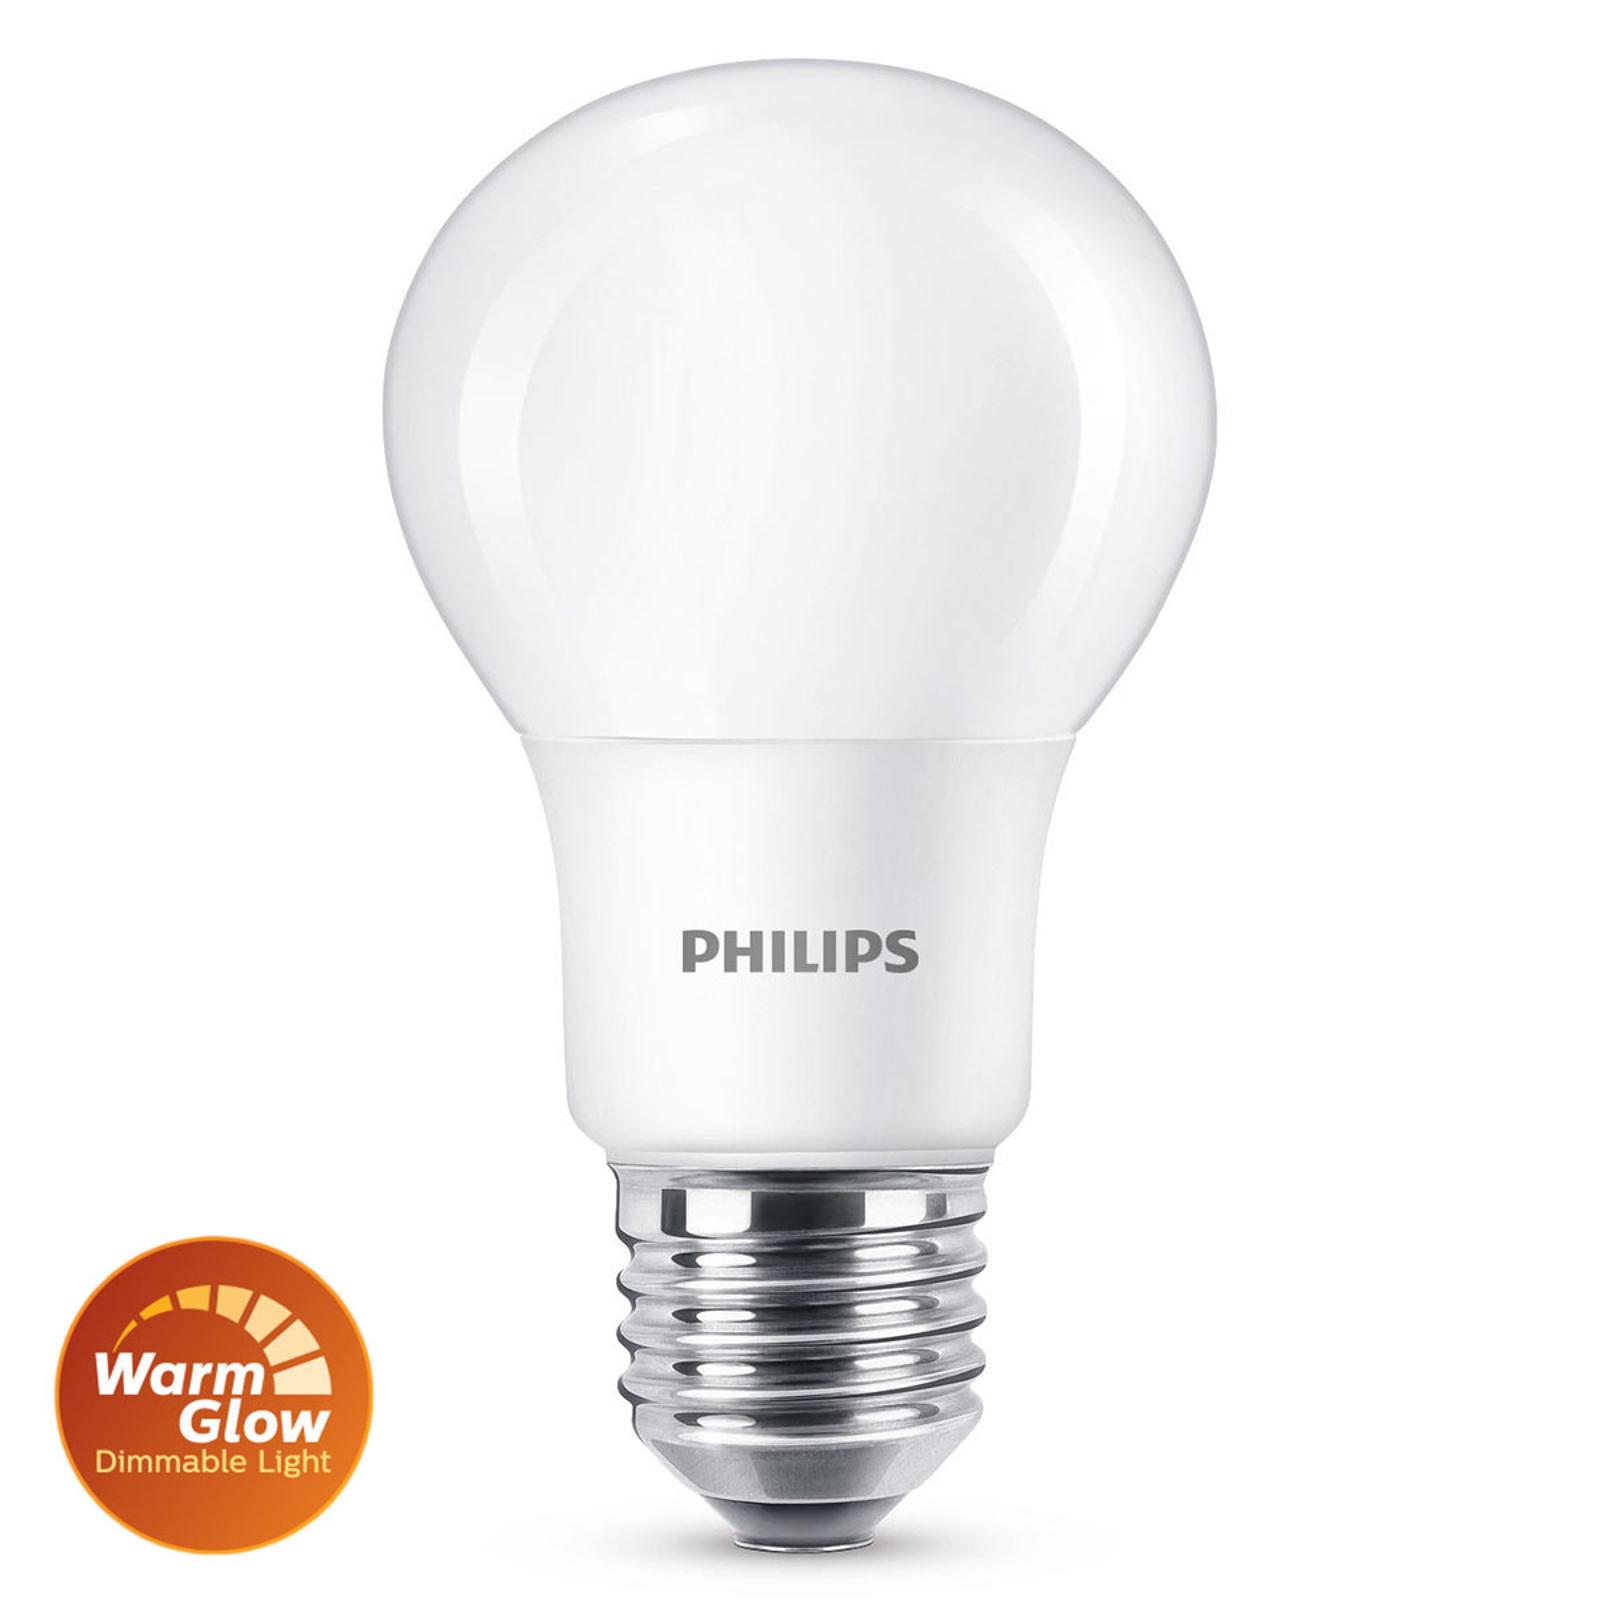 Philips E27 LED-lampa WarmGlow 5 W matt, dimbar